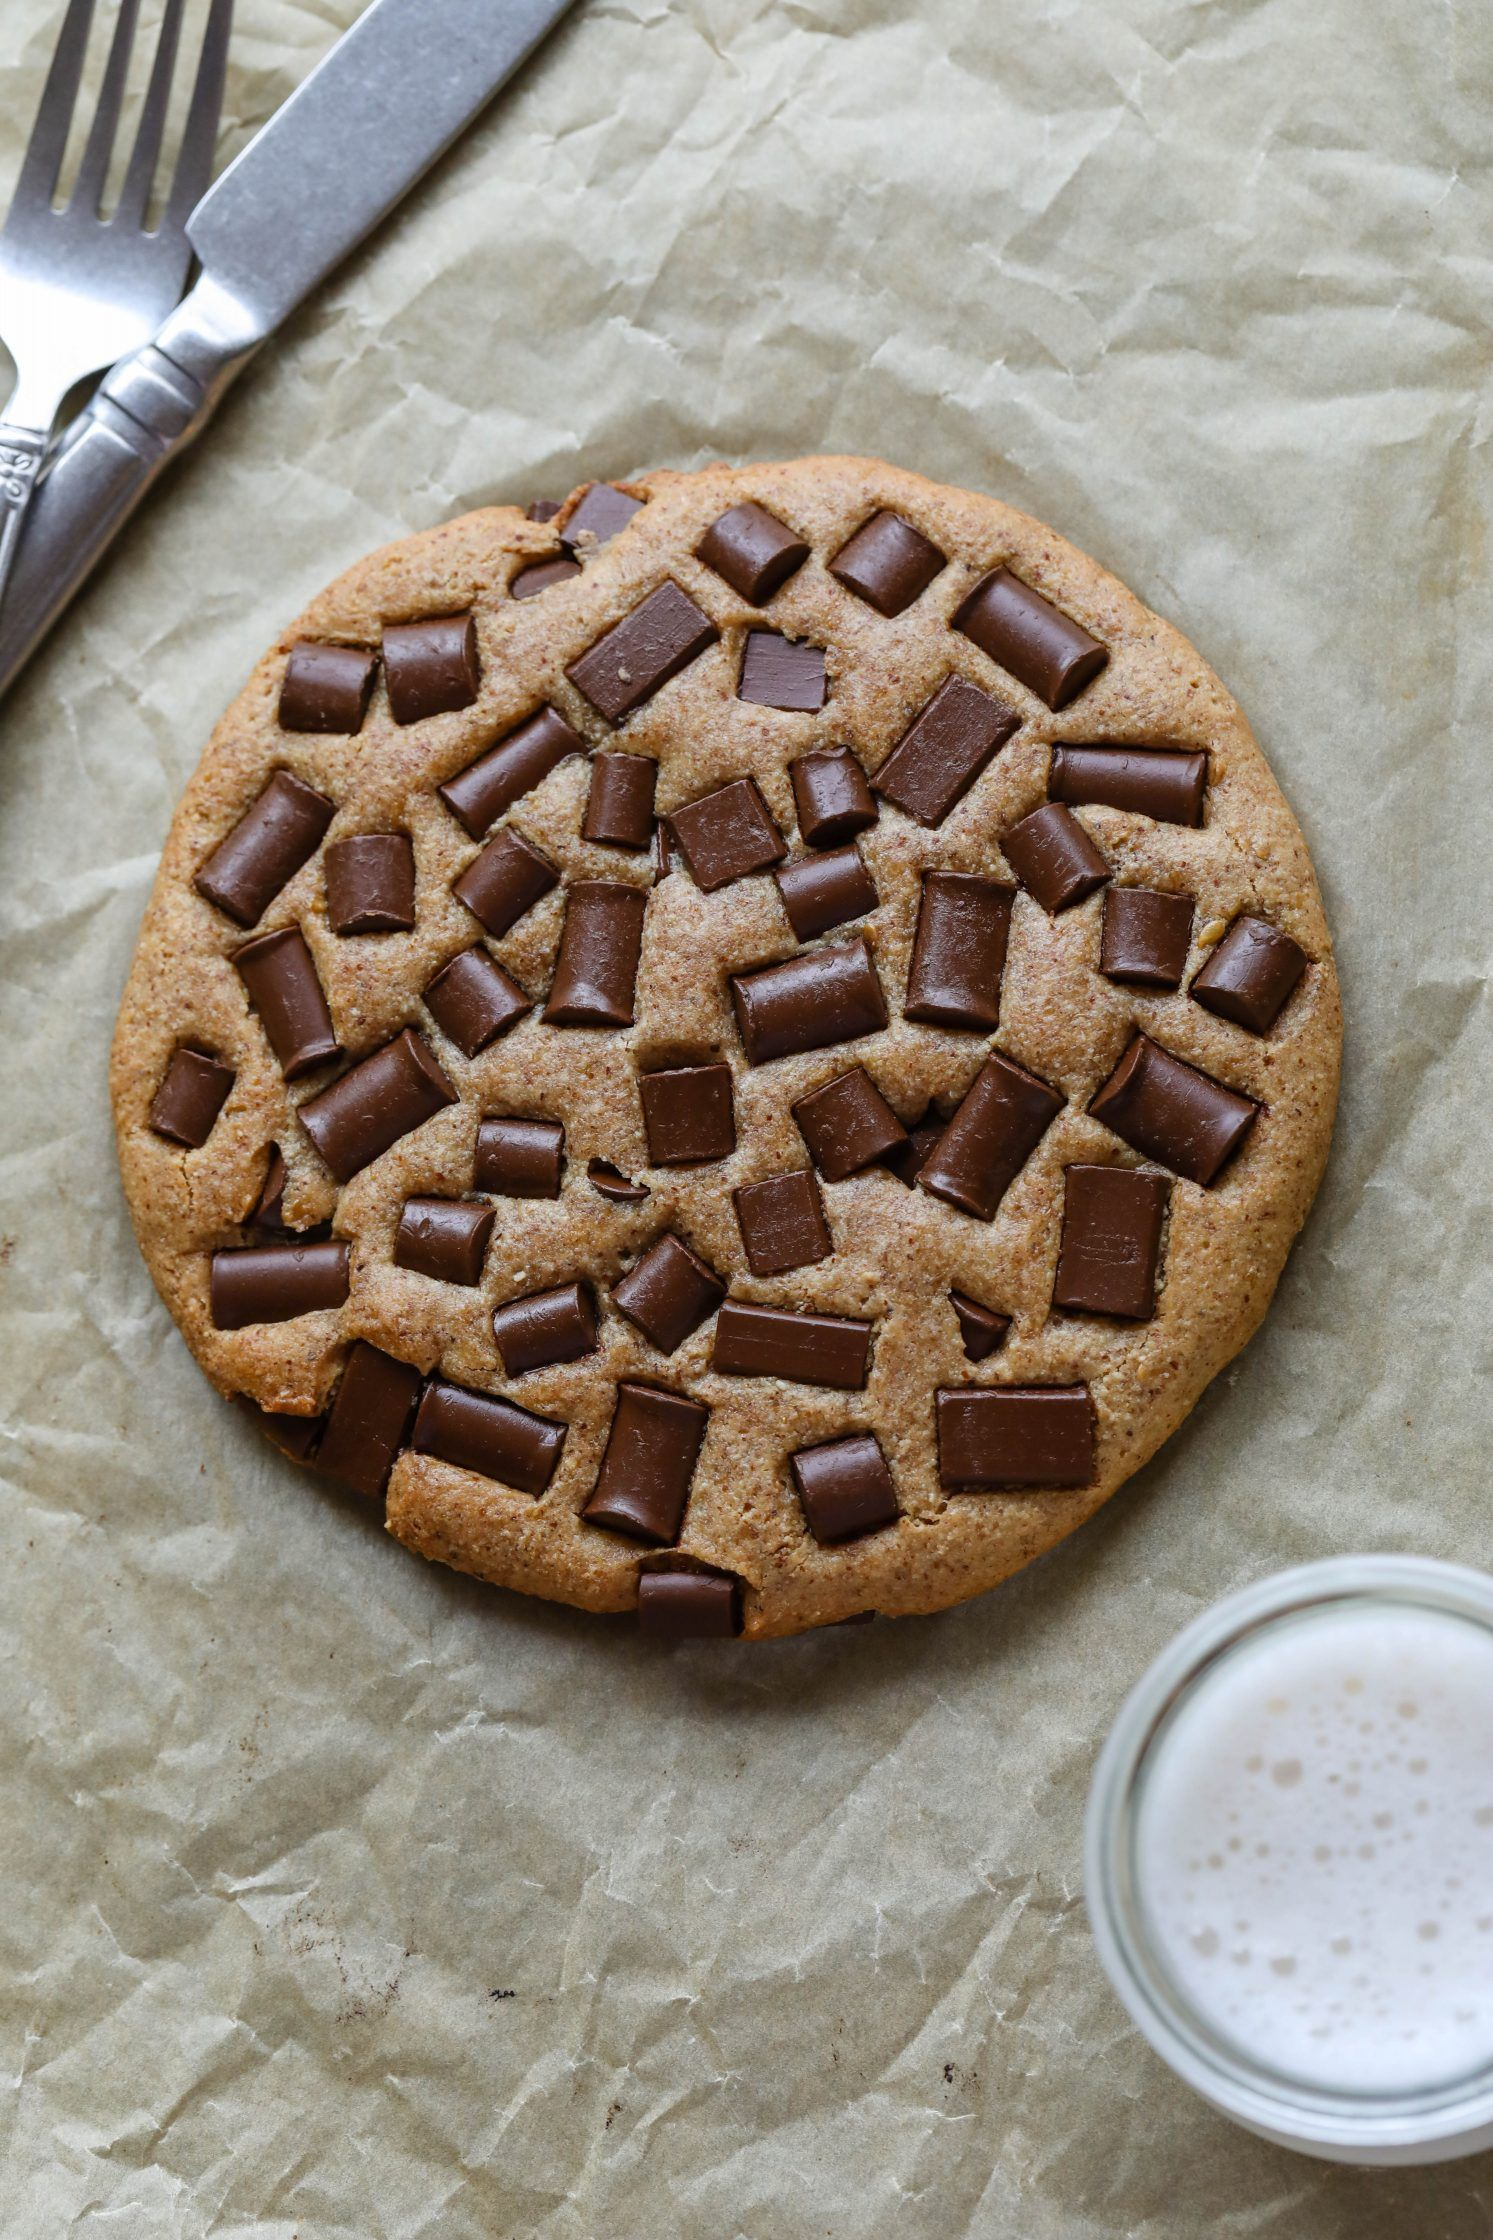 Giant Almond Flour Chocolate Chip Cookie Flora Vino Recipe In 2020 Almond Flour Chocolate Chip Cookies Chocolate Chip Cookies Healthy Cookie Recipes